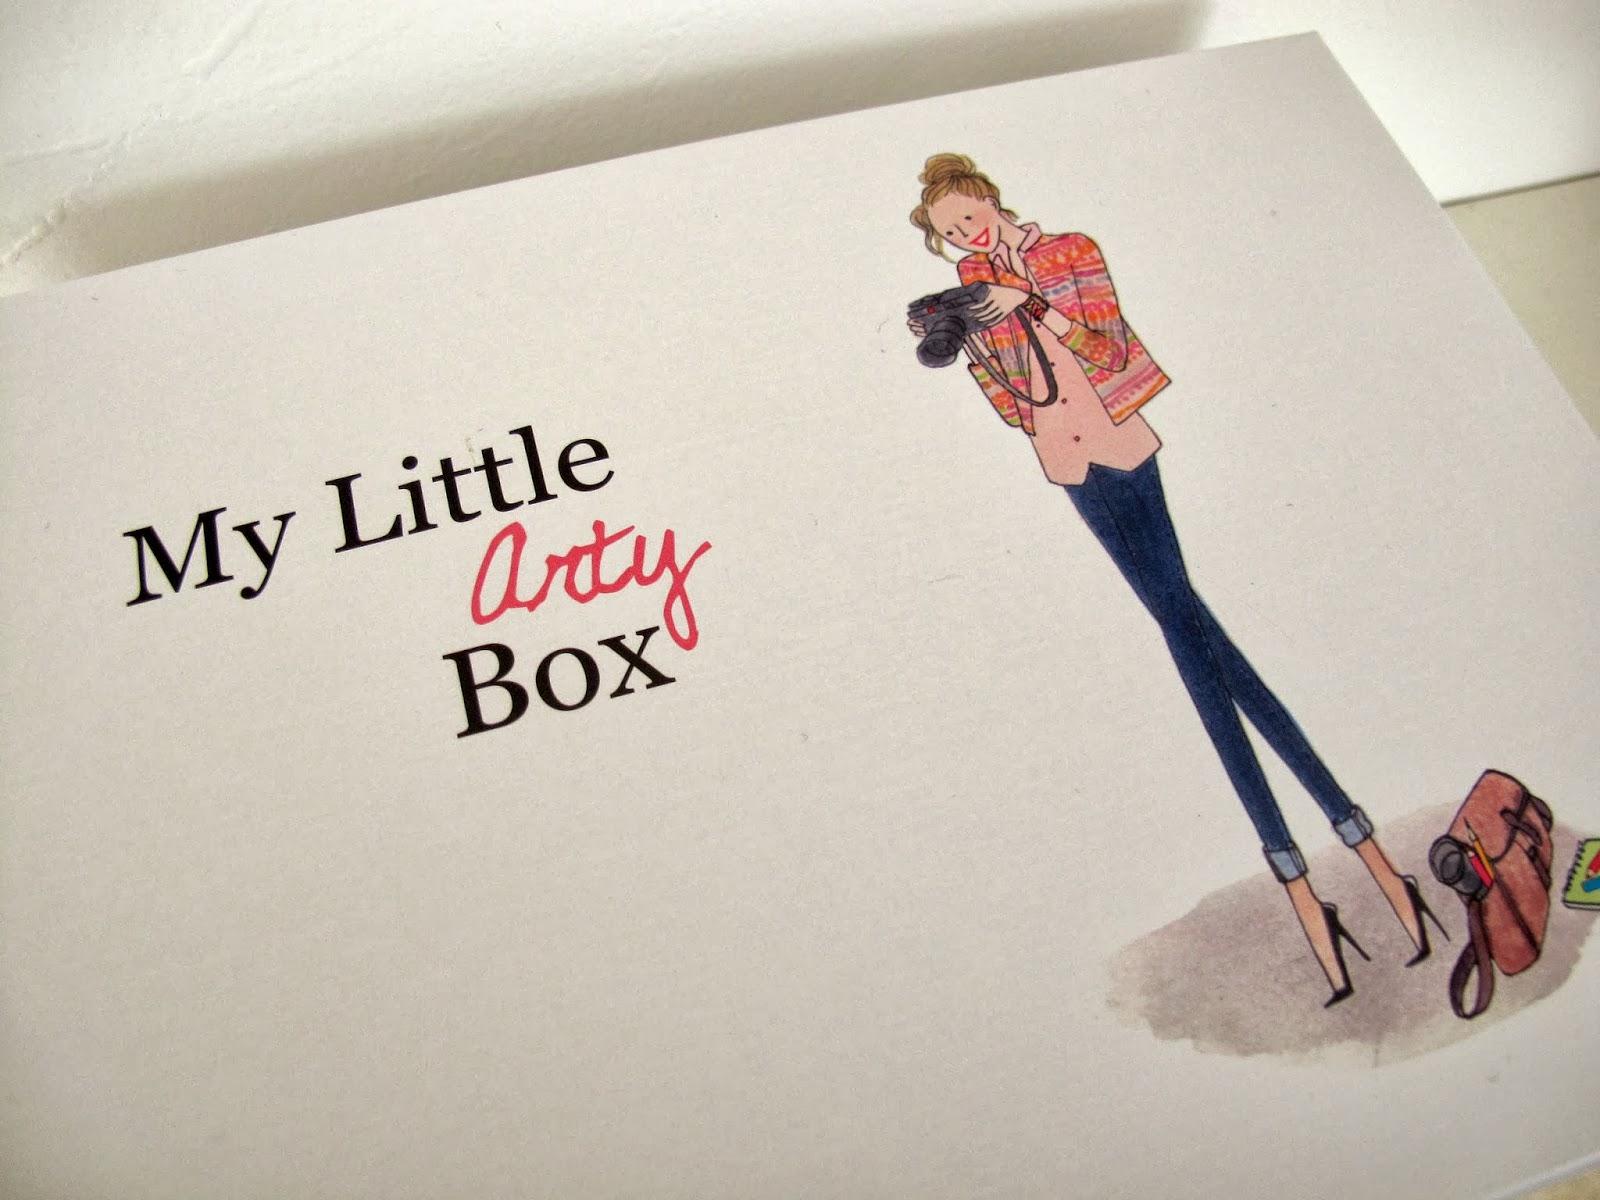 l 39 atelier d 39 enabis my little arty box. Black Bedroom Furniture Sets. Home Design Ideas